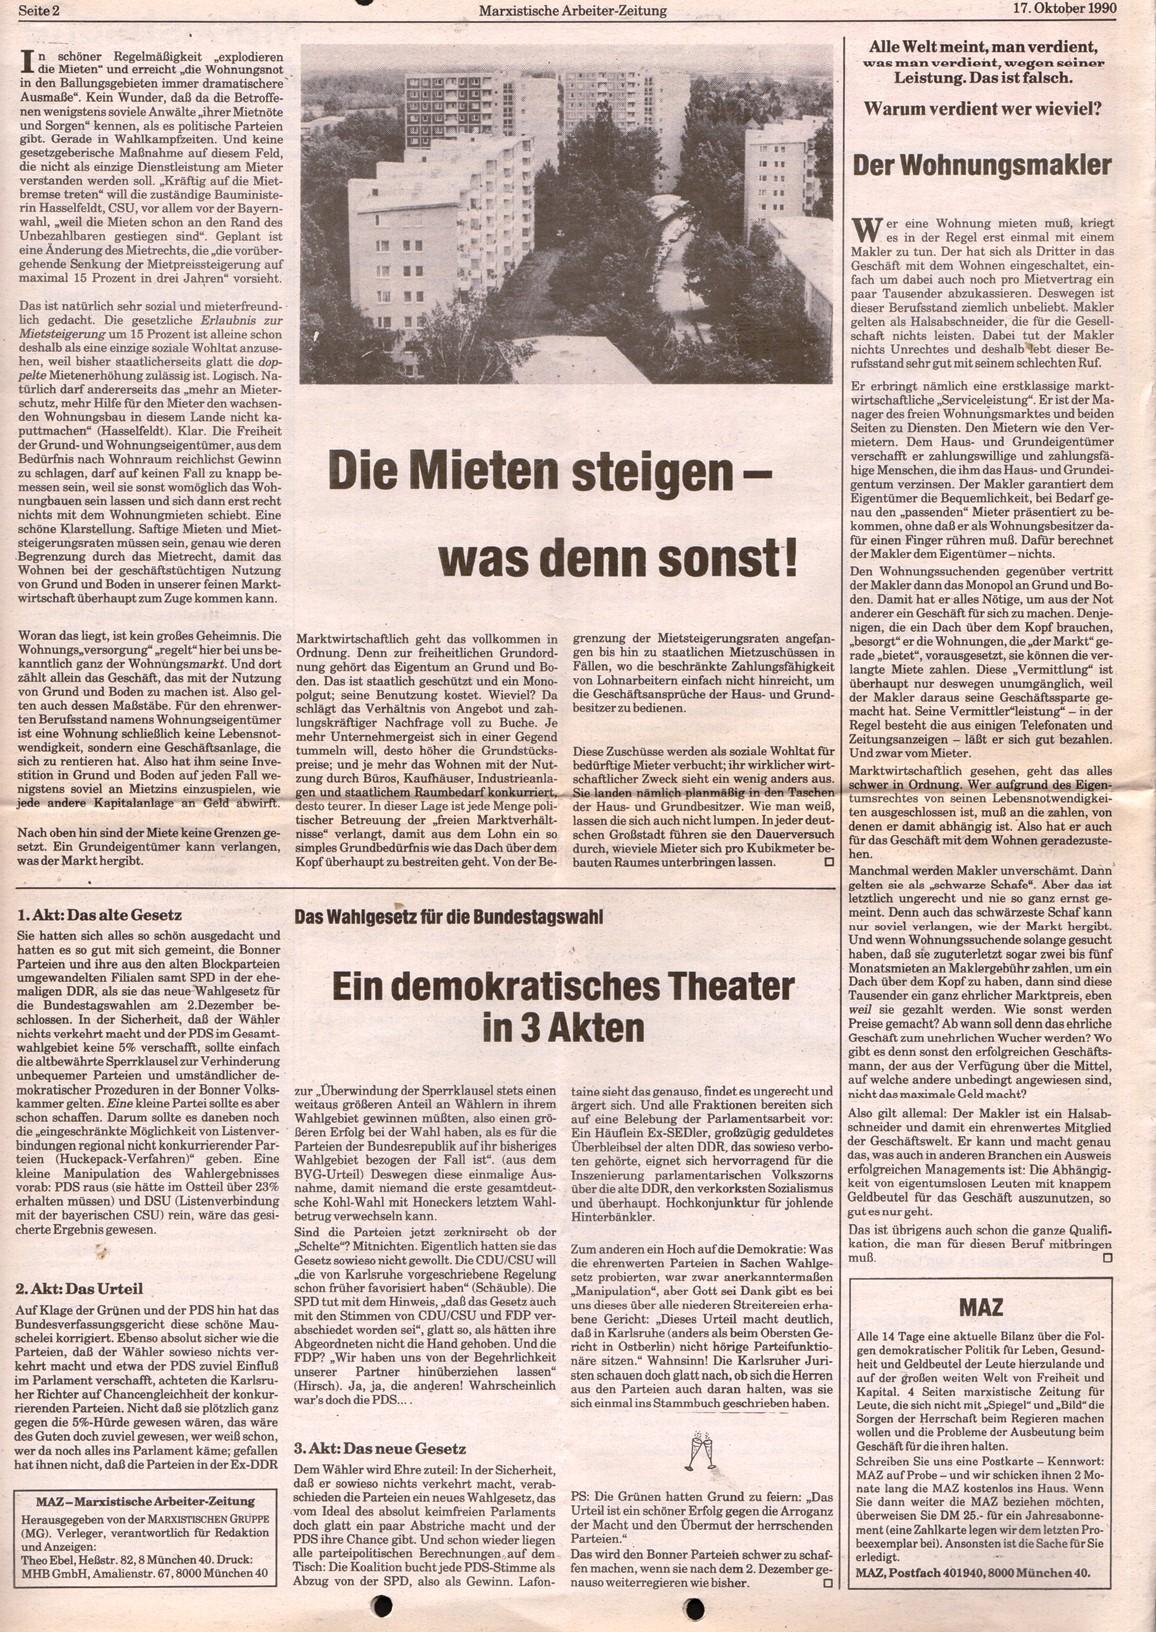 Muenchen_MG_MAZ_19901017_02